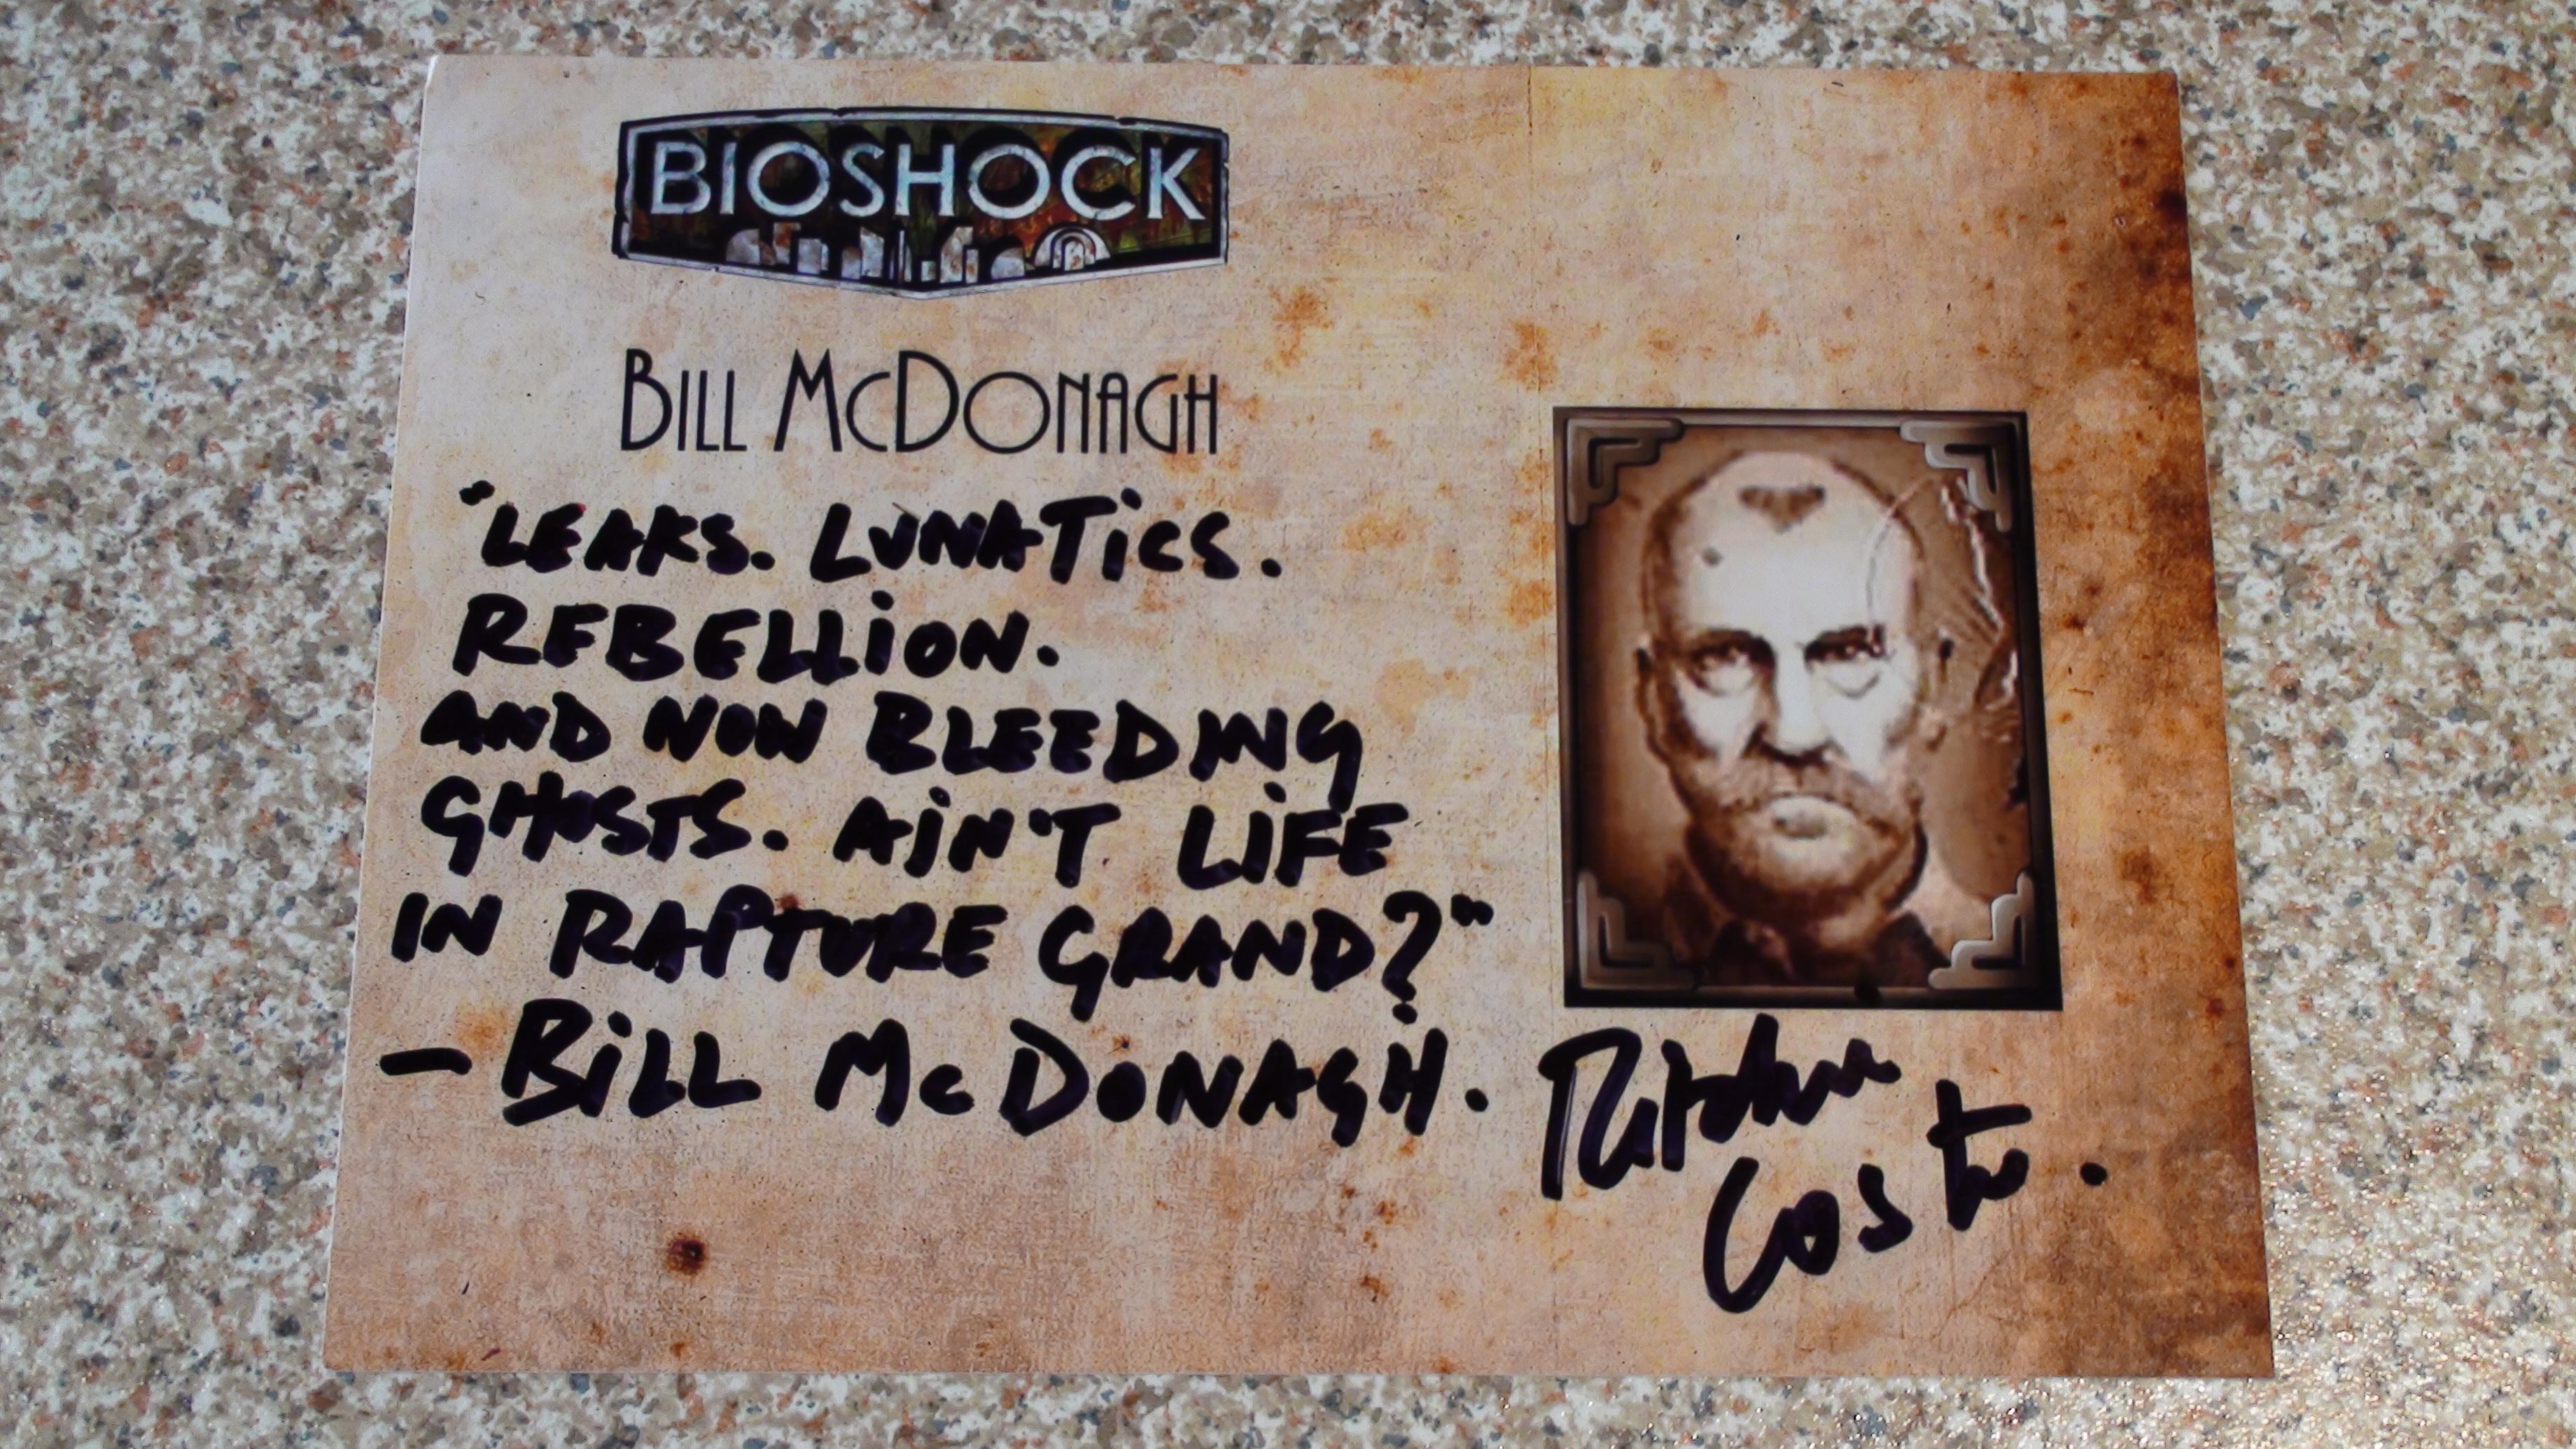 Bioshock - Ritchie Coster